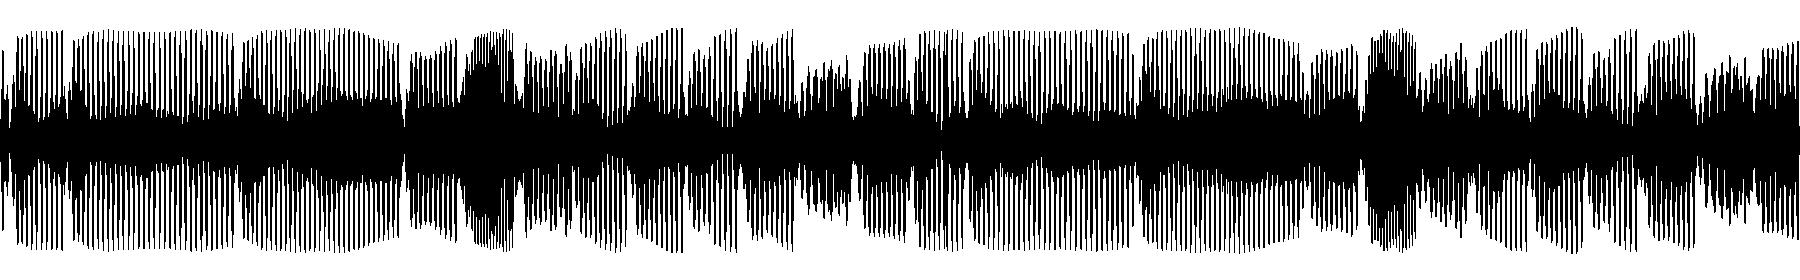 bsq 9m133 6 kornet